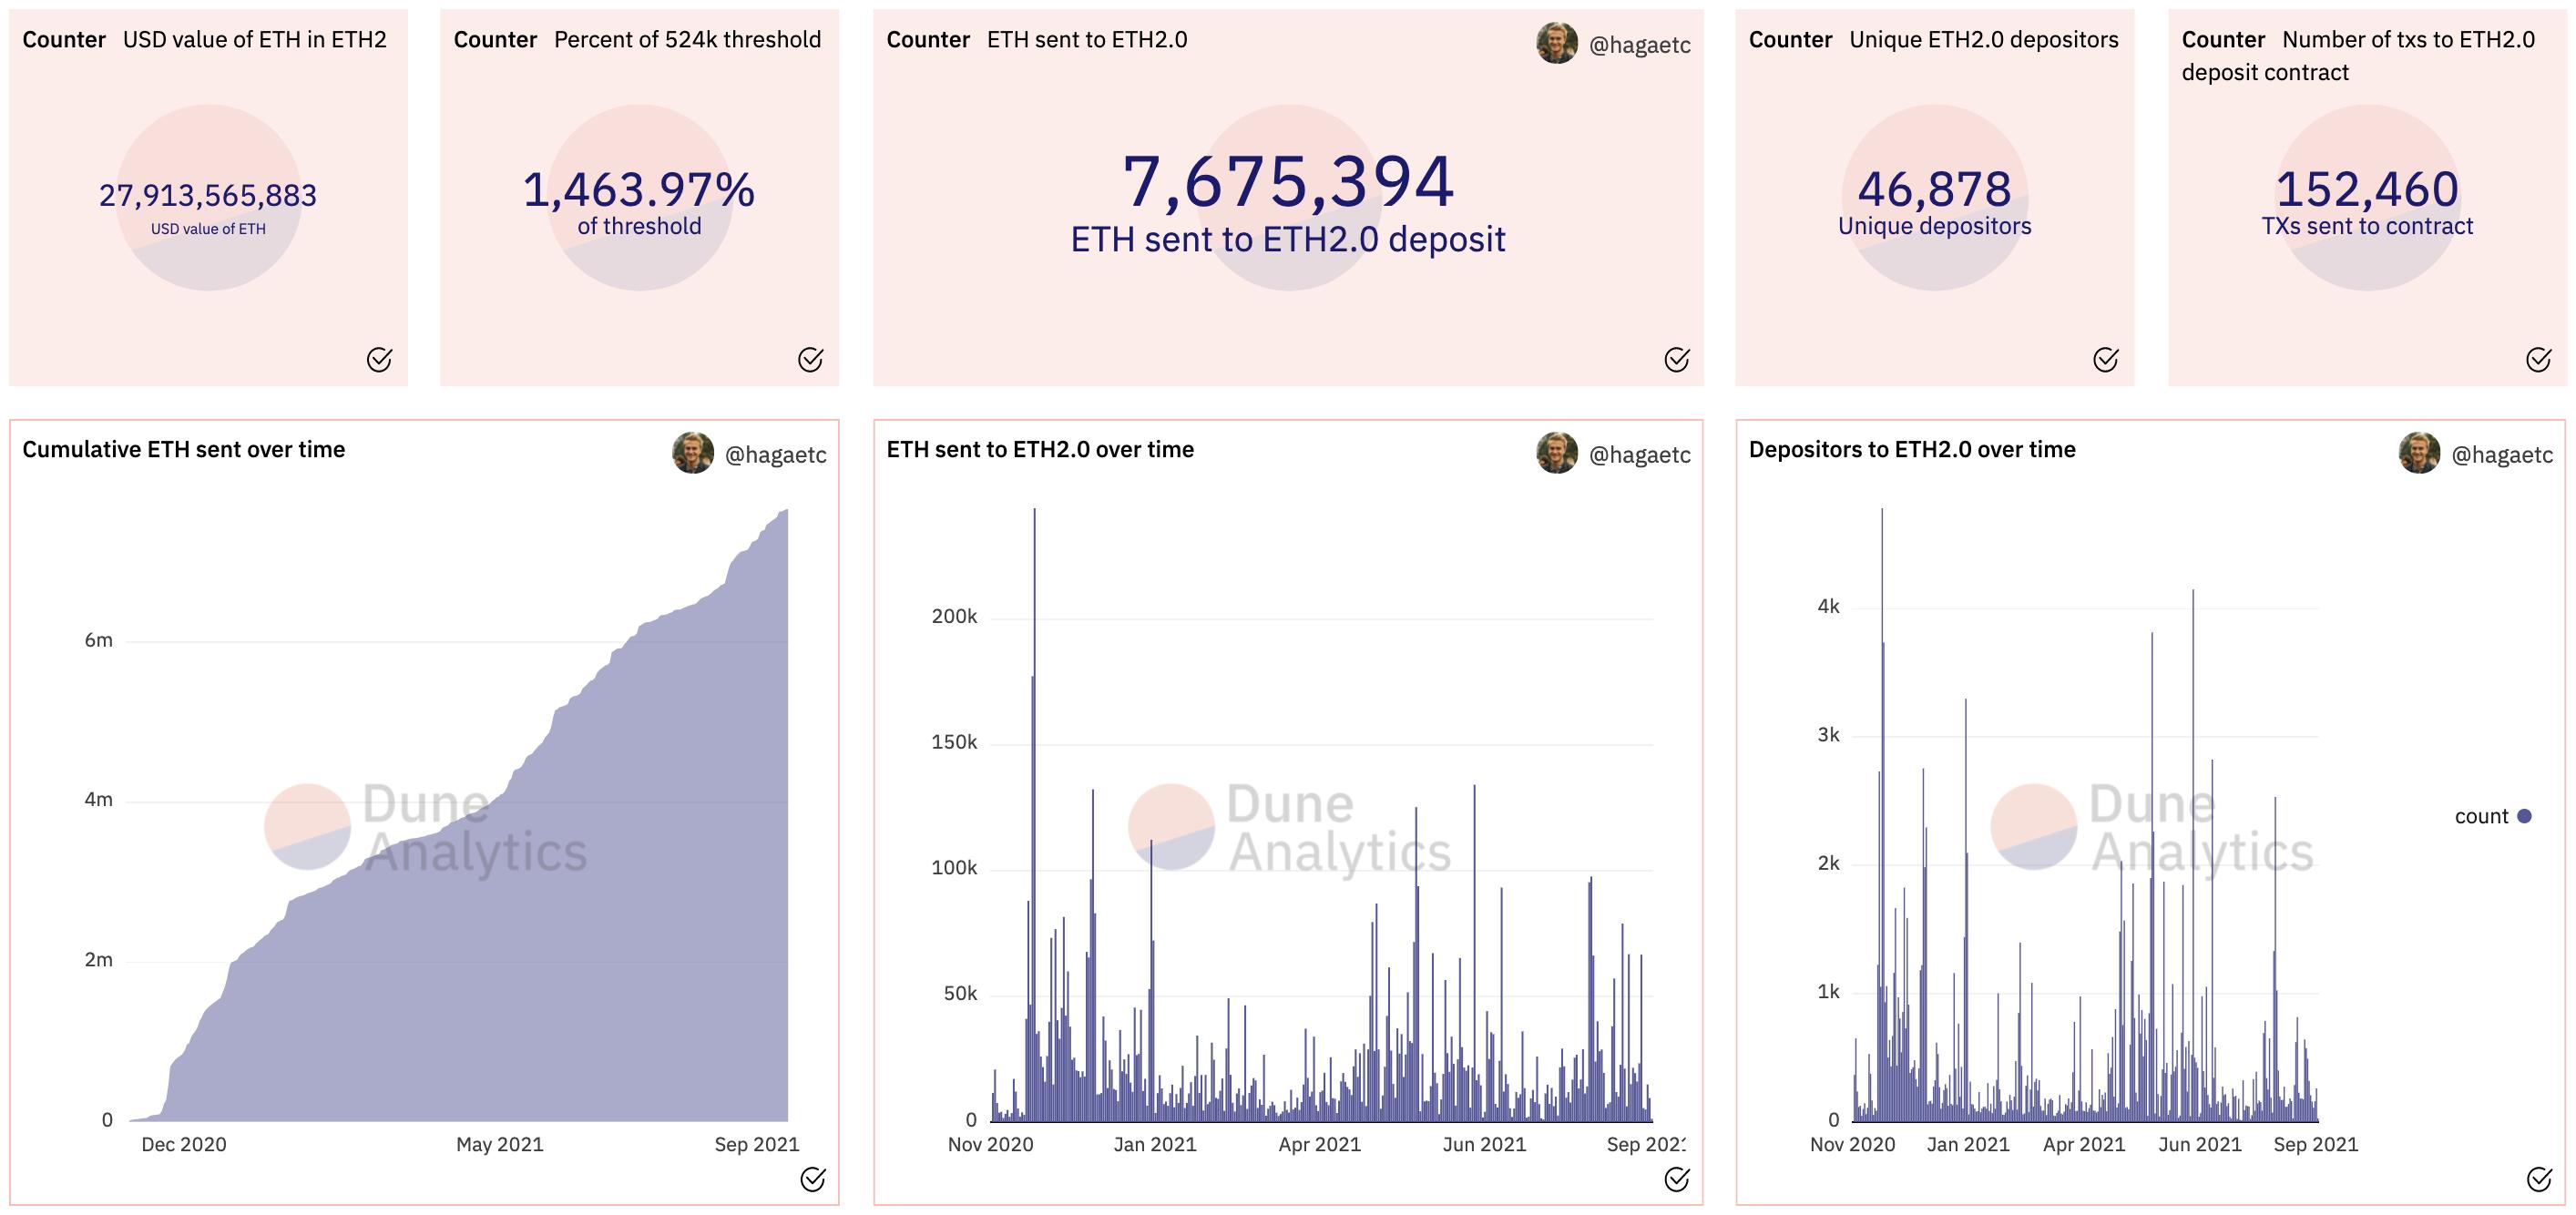 Ethereum 2.0 Deposit Contract